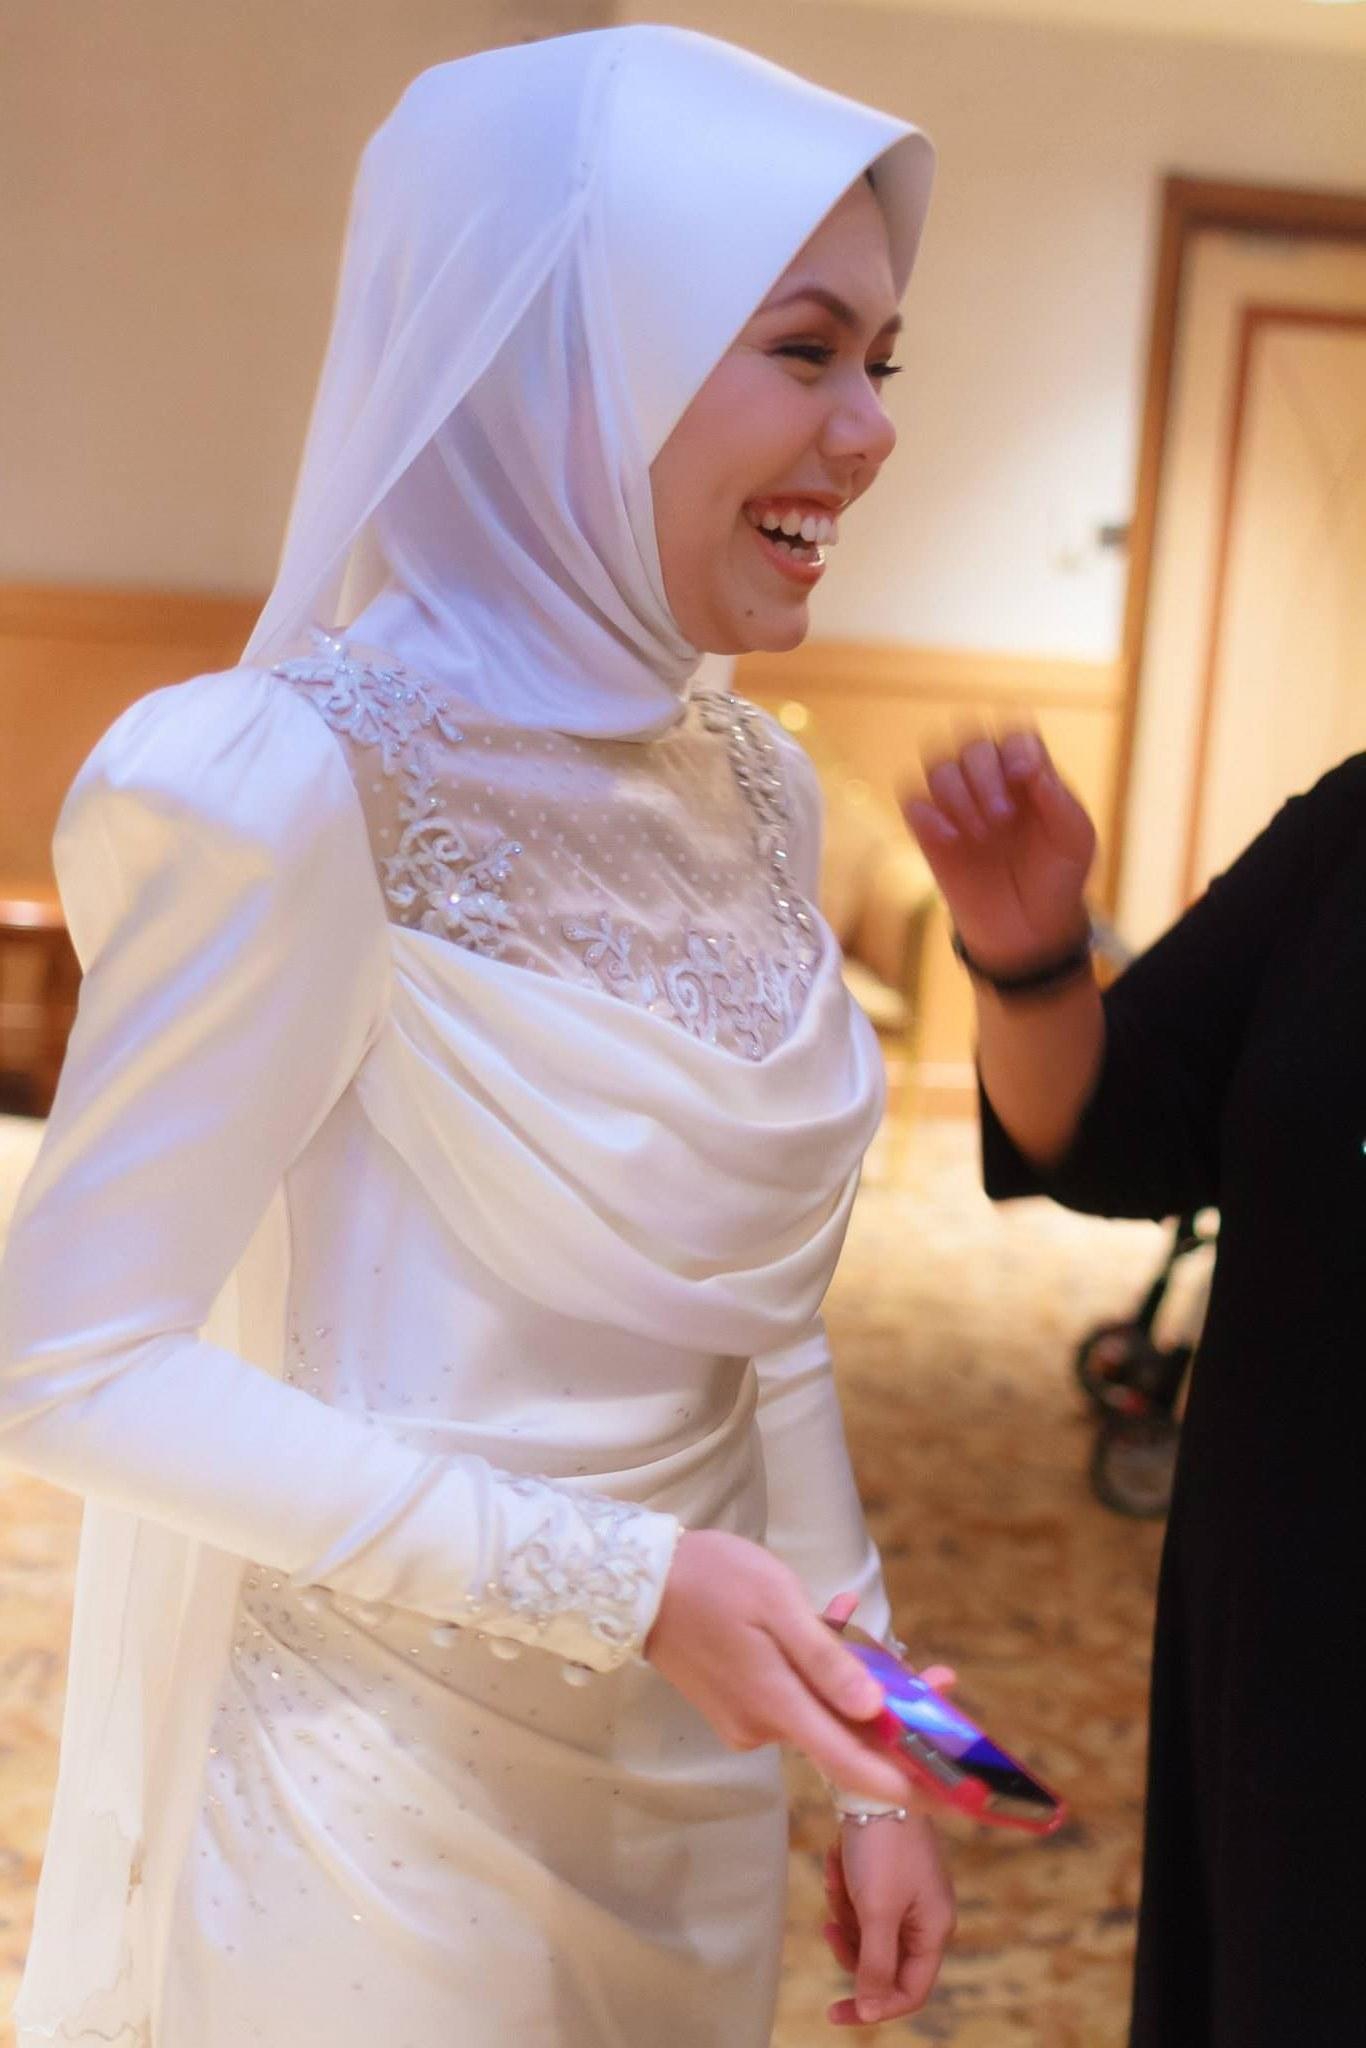 Model Busana Pengantin Hijab 87dx Baju Pengantin Moden Baju Pengantin songket by Melinda